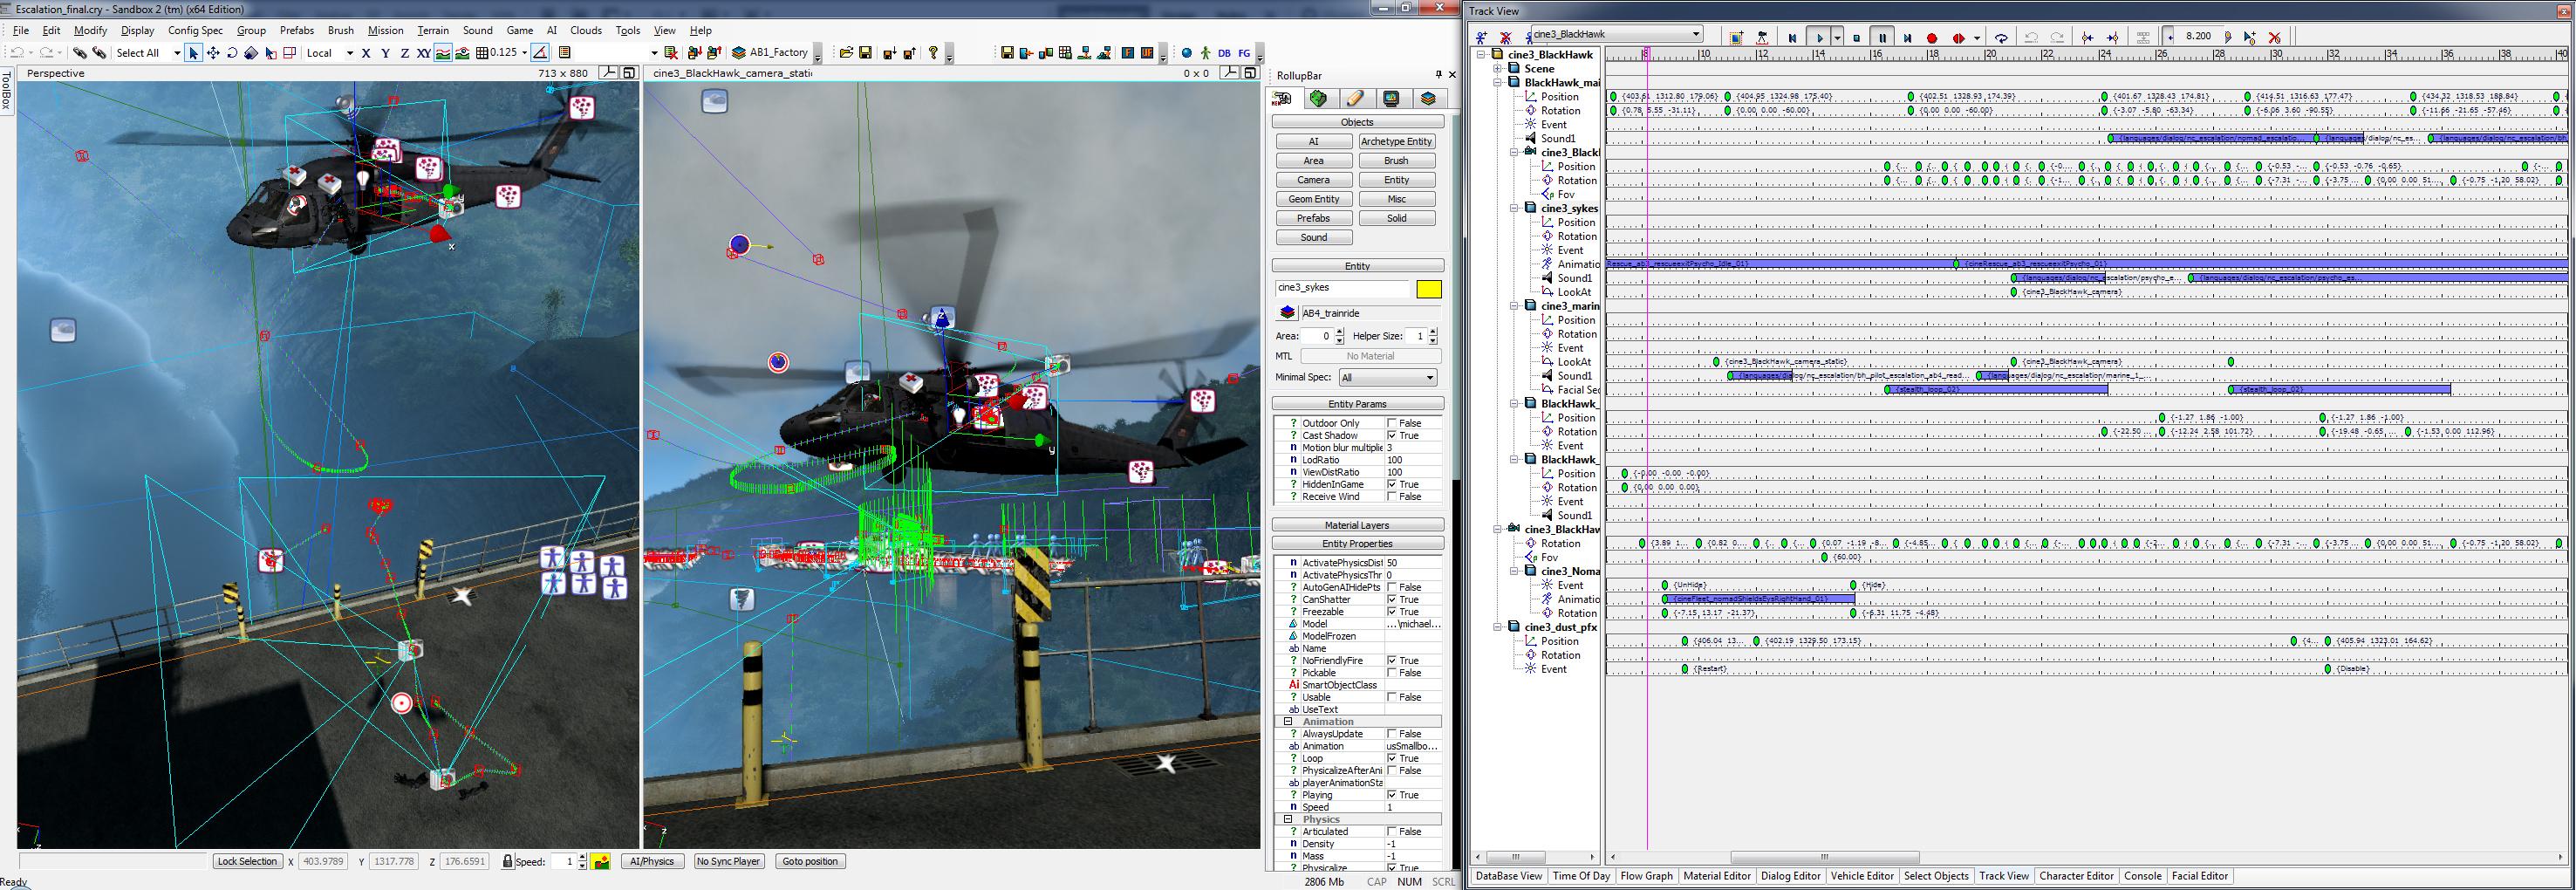 sandbox 2 screenshot trackview editor image nuclear cataclysm